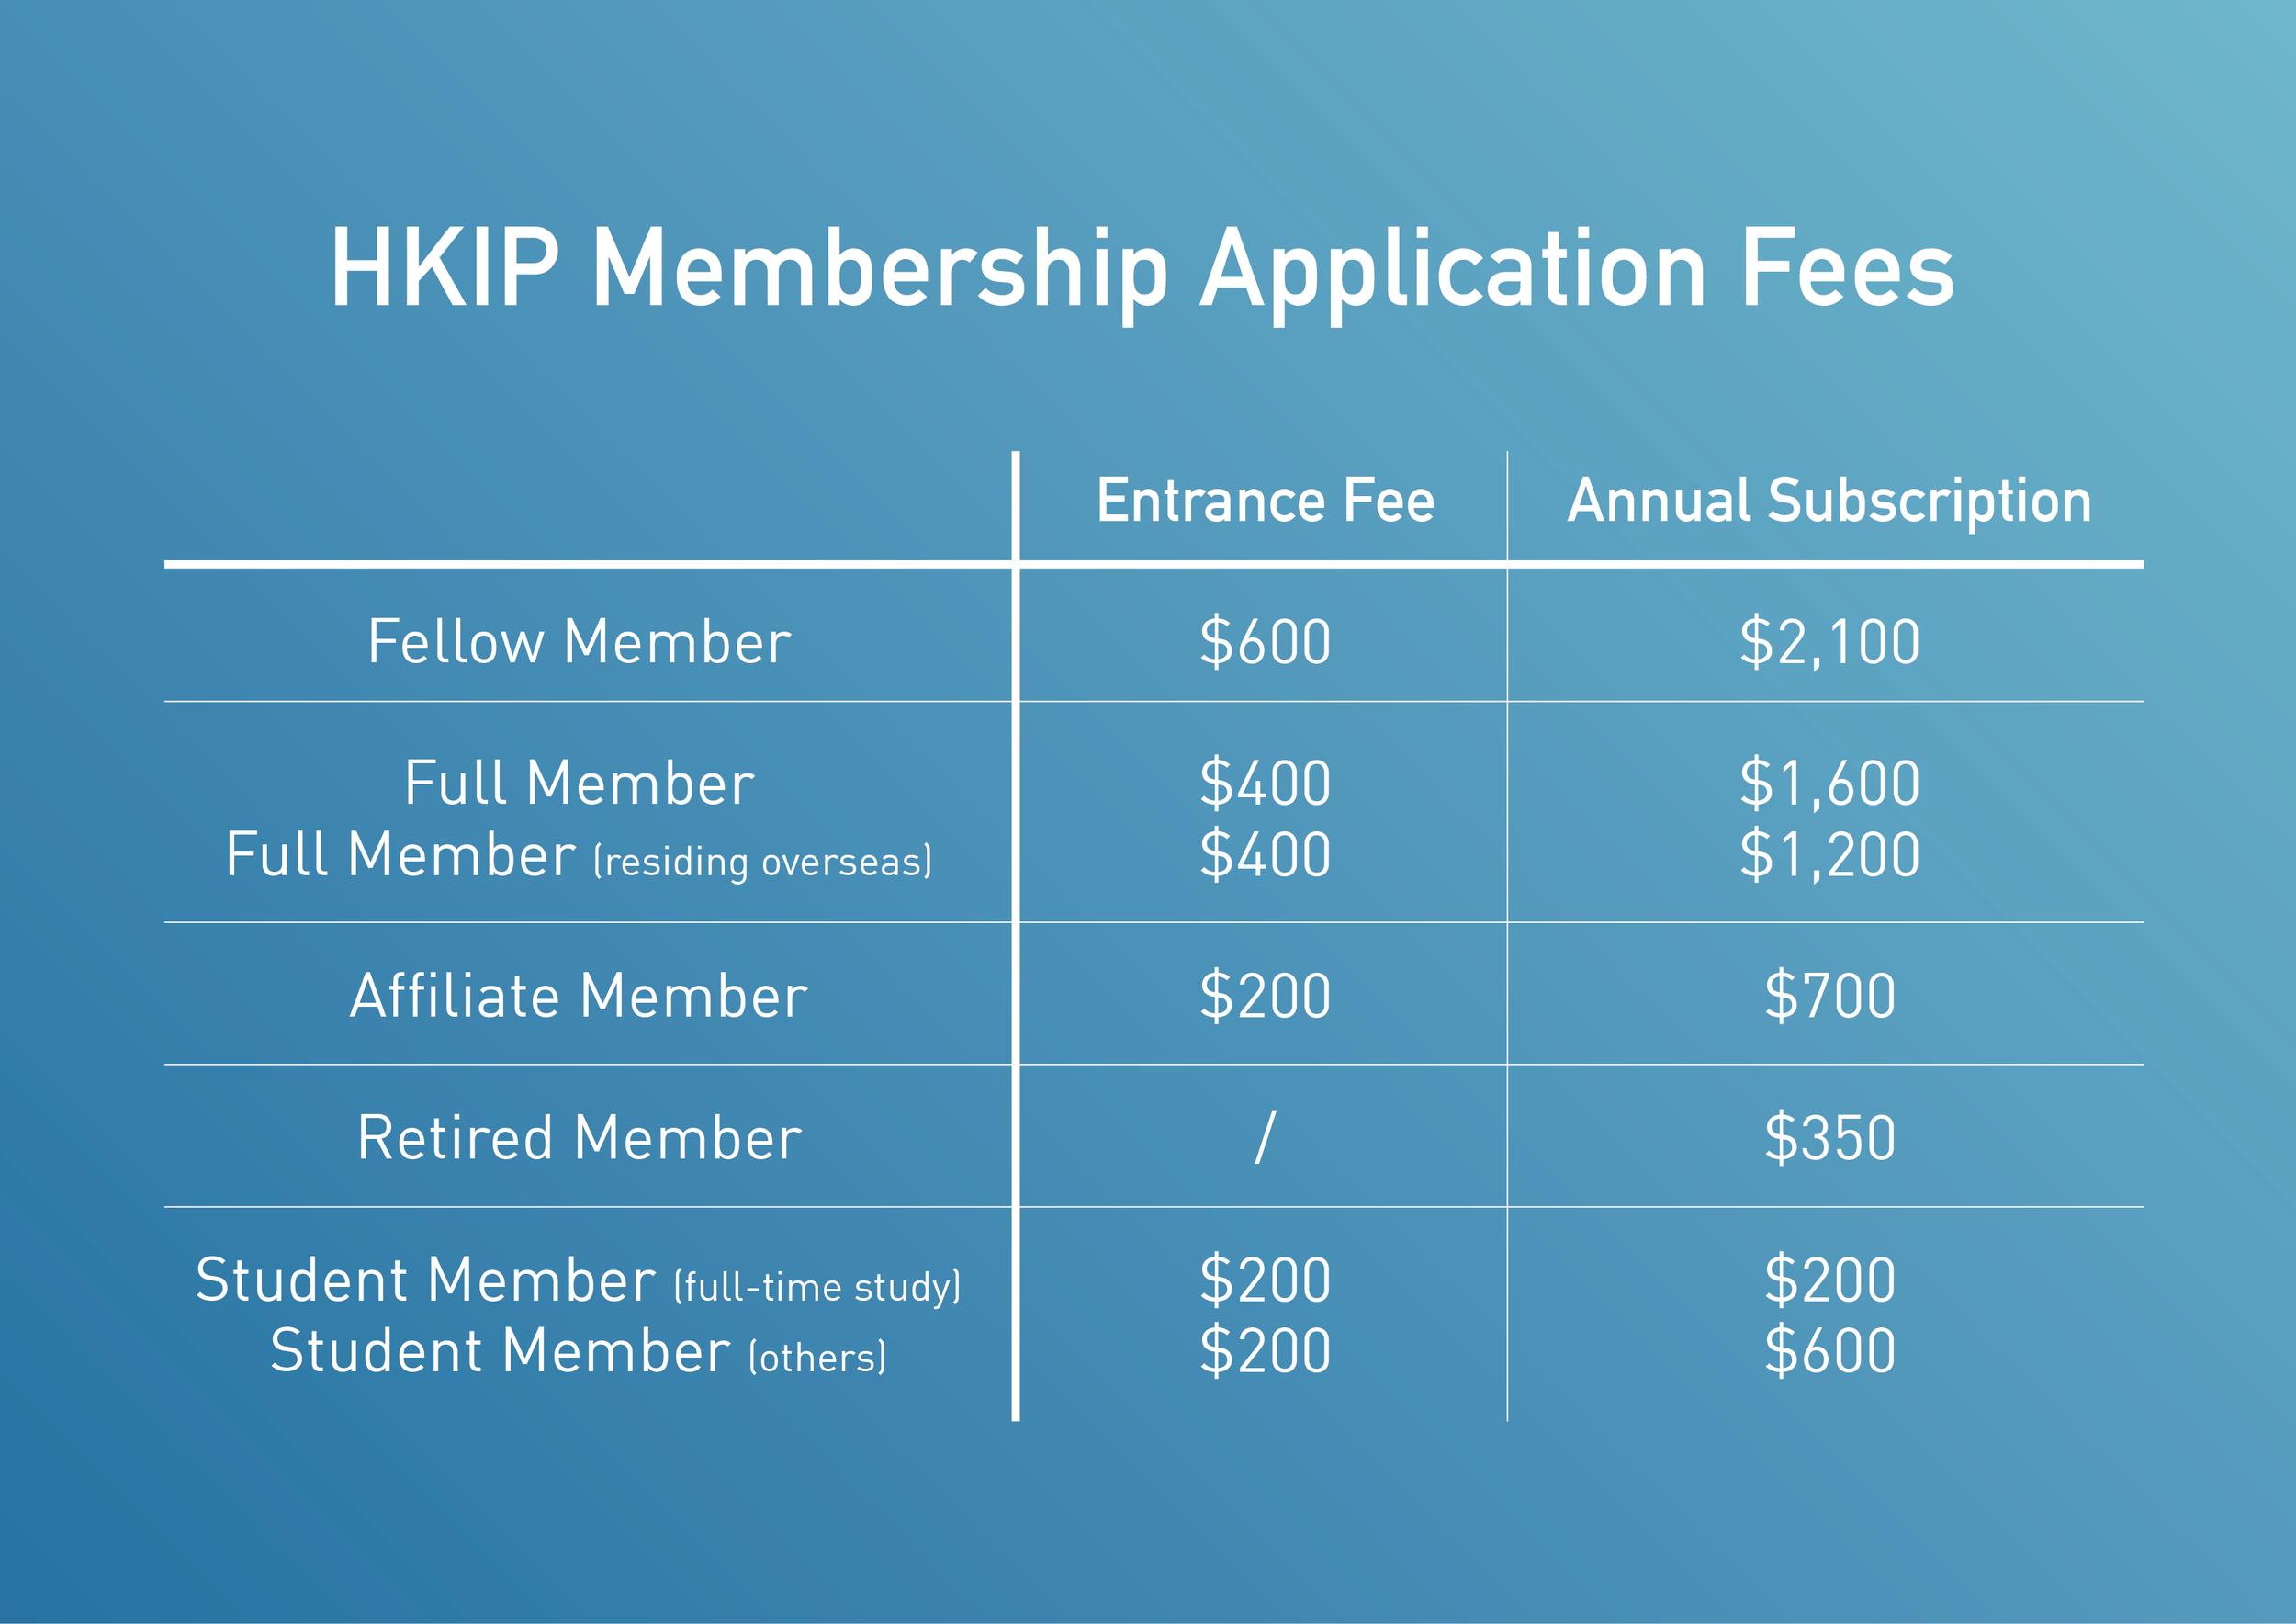 HKIP Membership Application Fees